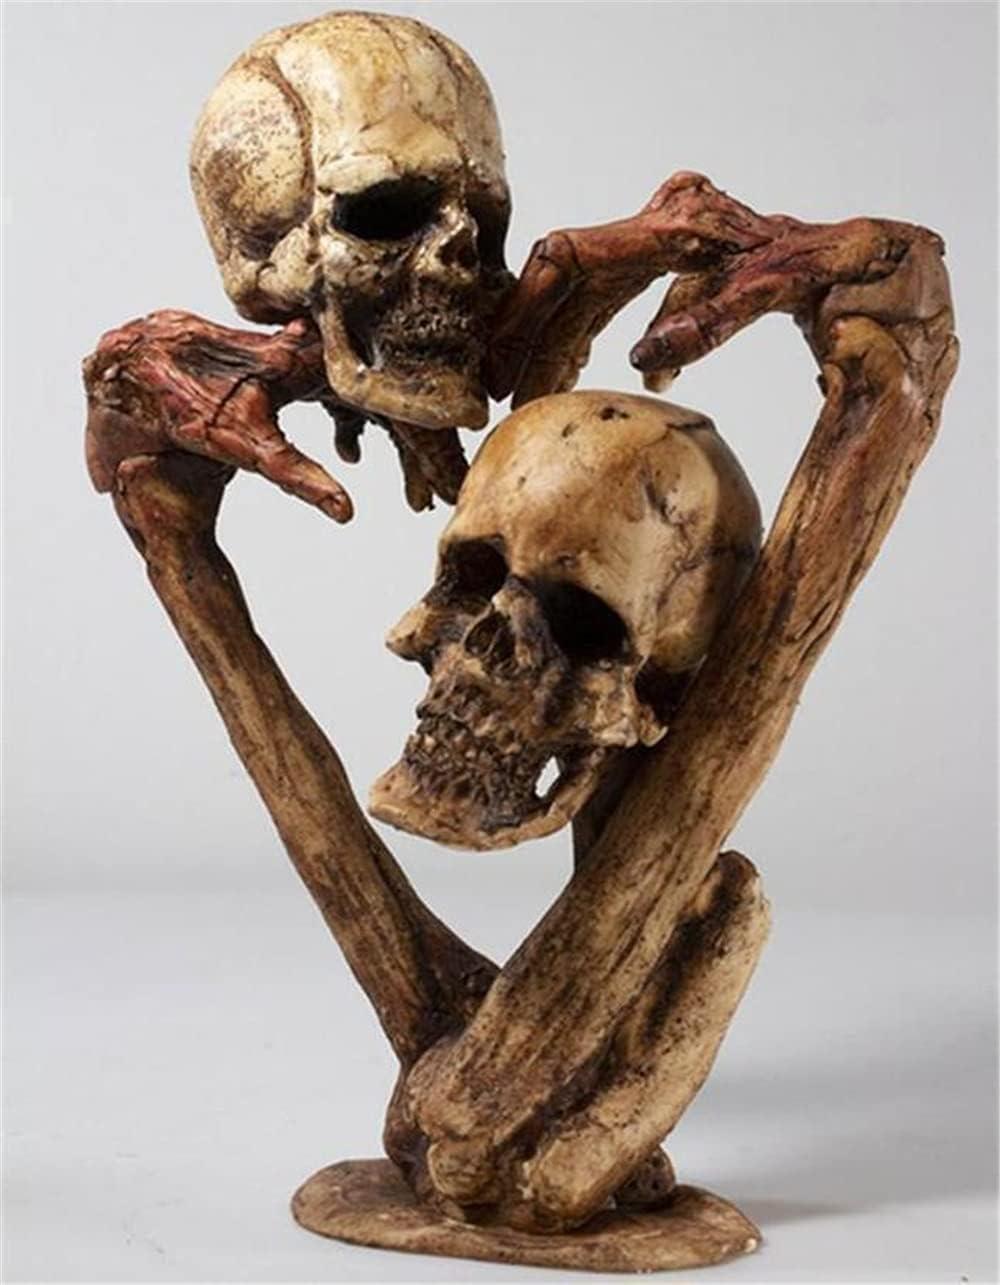 FZHGHJT Halloween Skull 25% OFF Outlet SALE Decoration Crazy Craz Sculptures